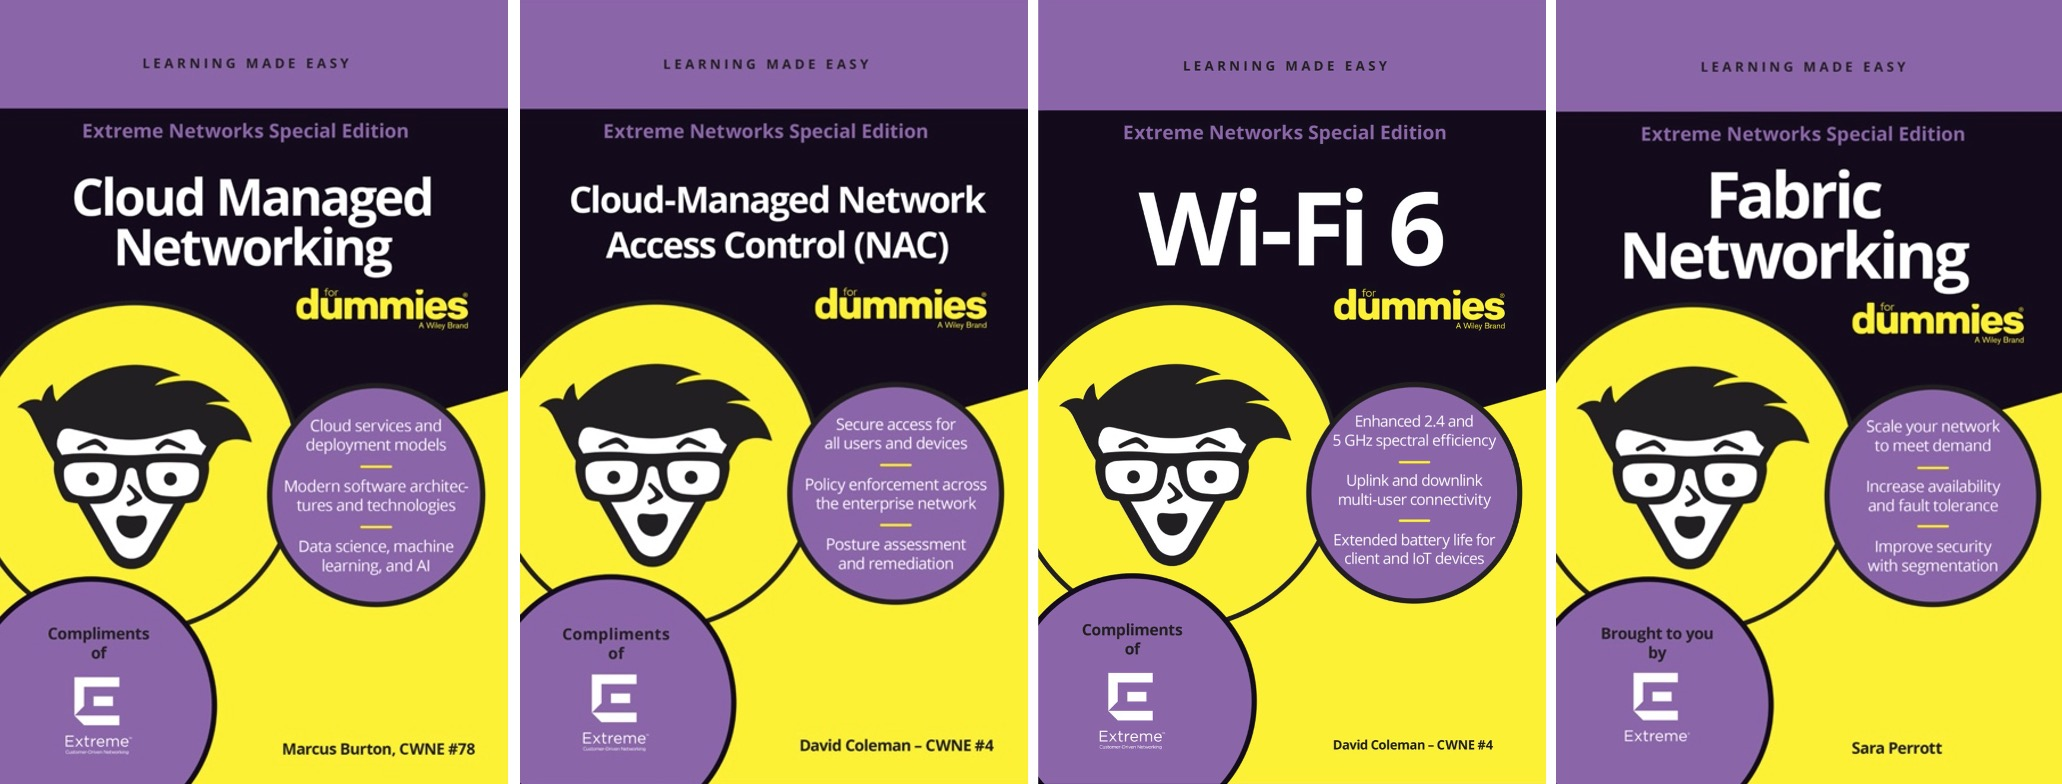 Подборка литературы по сетевым технологиям от компании Extreme Networks